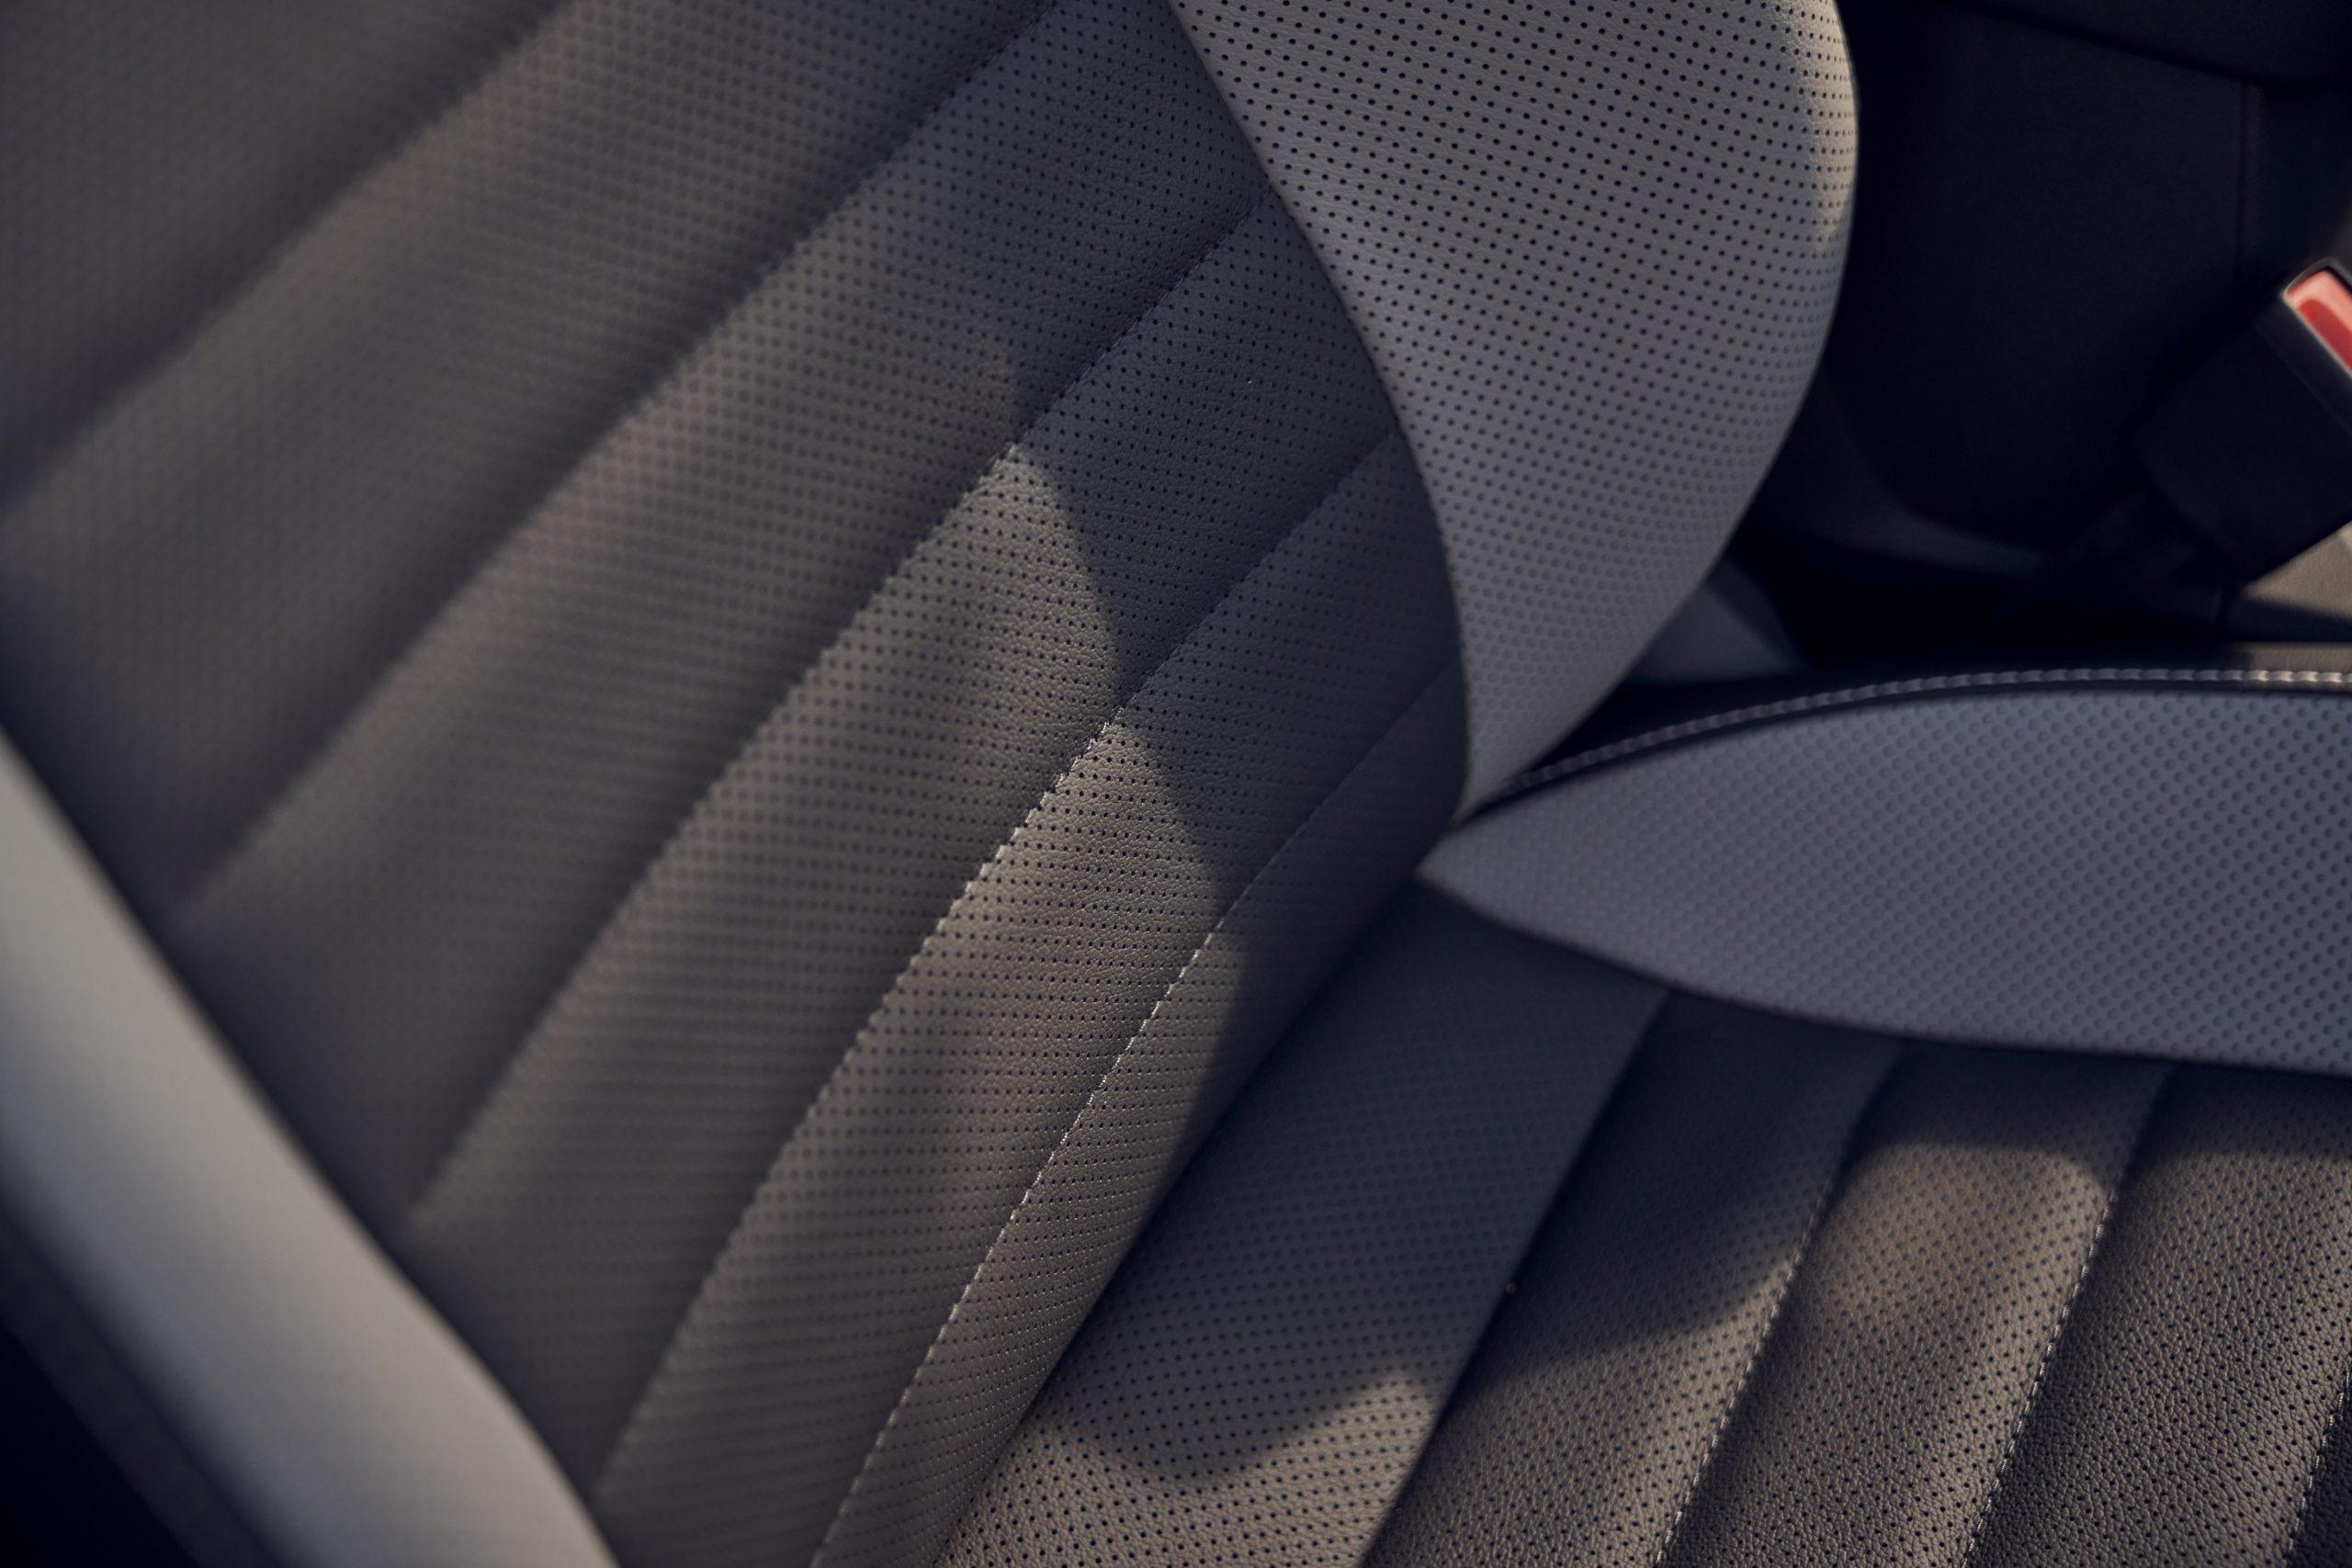 2022 Volkswagen Taos interior seat detail